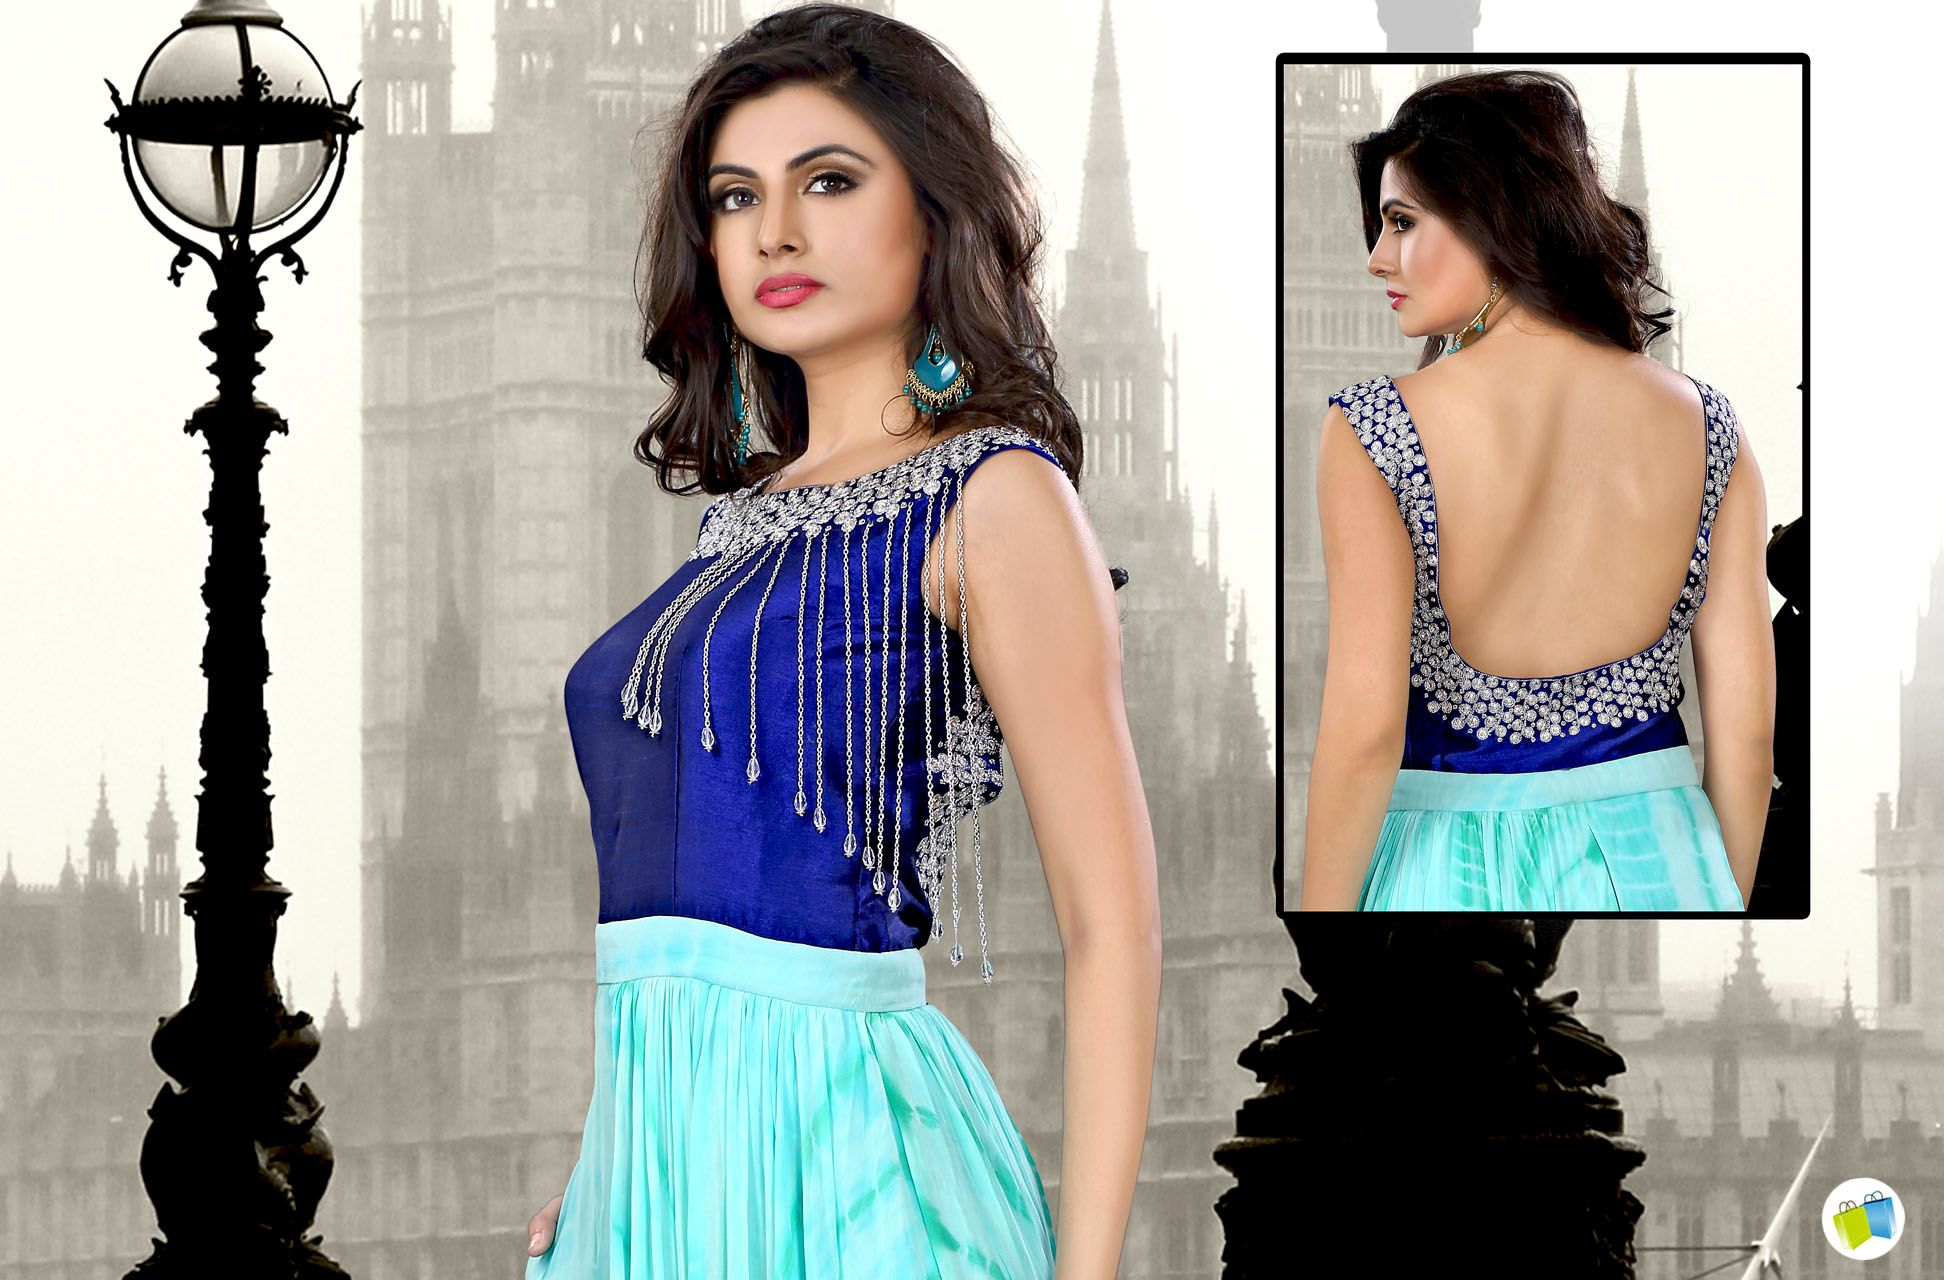 Buy Readymade Indo Western Dresses Online for Girls   https://goo.gl/c53QY2  #indiabazaaronline #IndowesternDresses #ReadymadeIndowesternGown #BuyIndoWesternDressonline #DesignerDresses